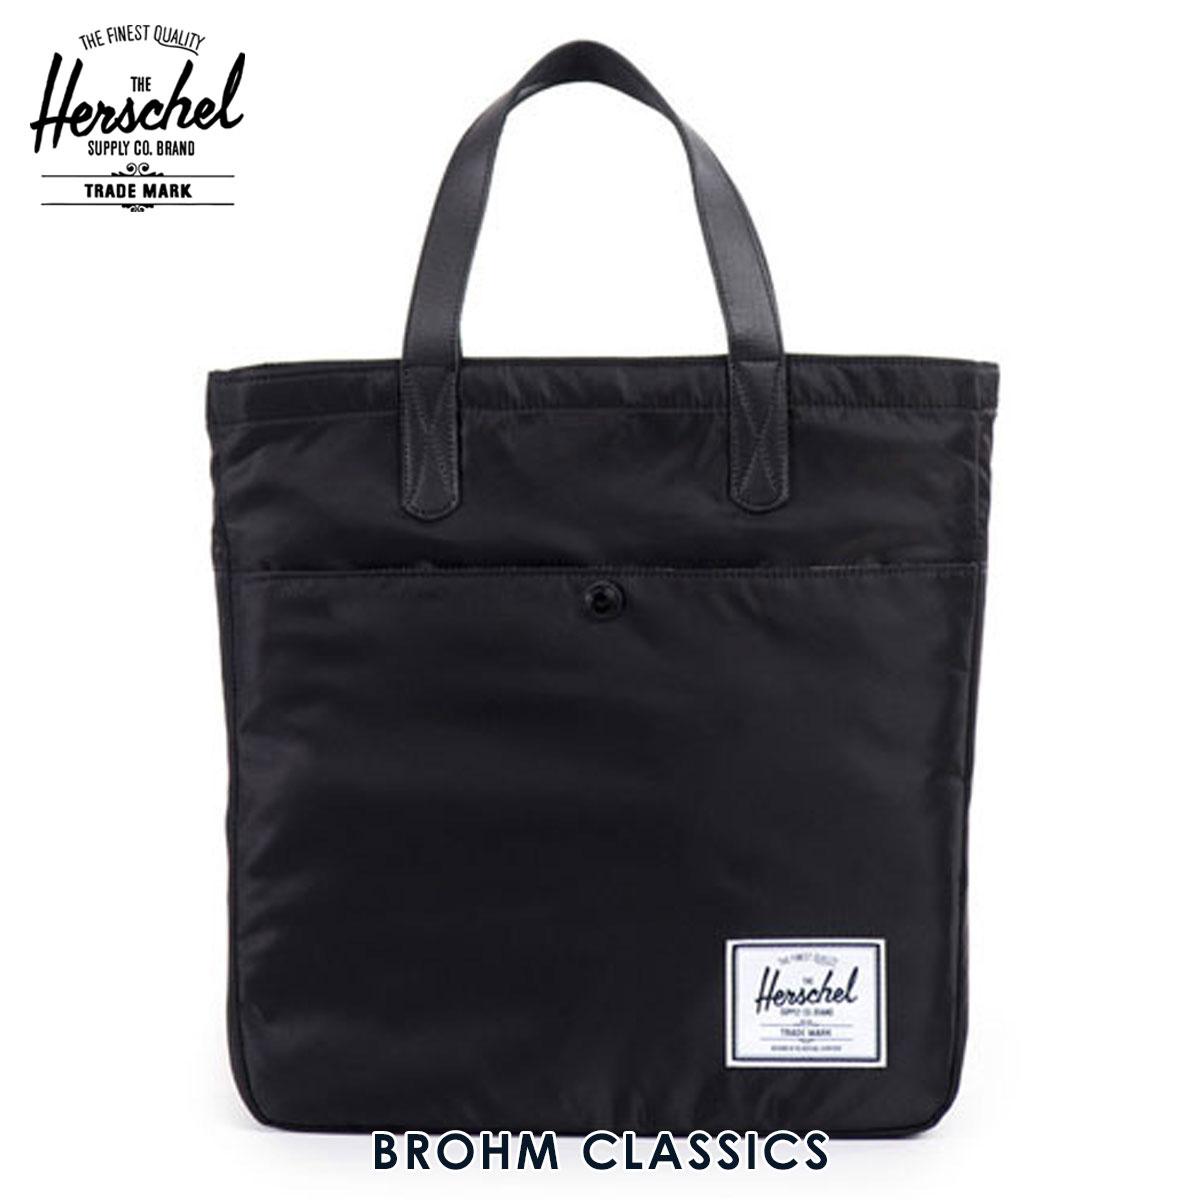 5139016fdb Rakuten Ichiba shop MIXON  Herschel Herschel bag Brohm Classics ...